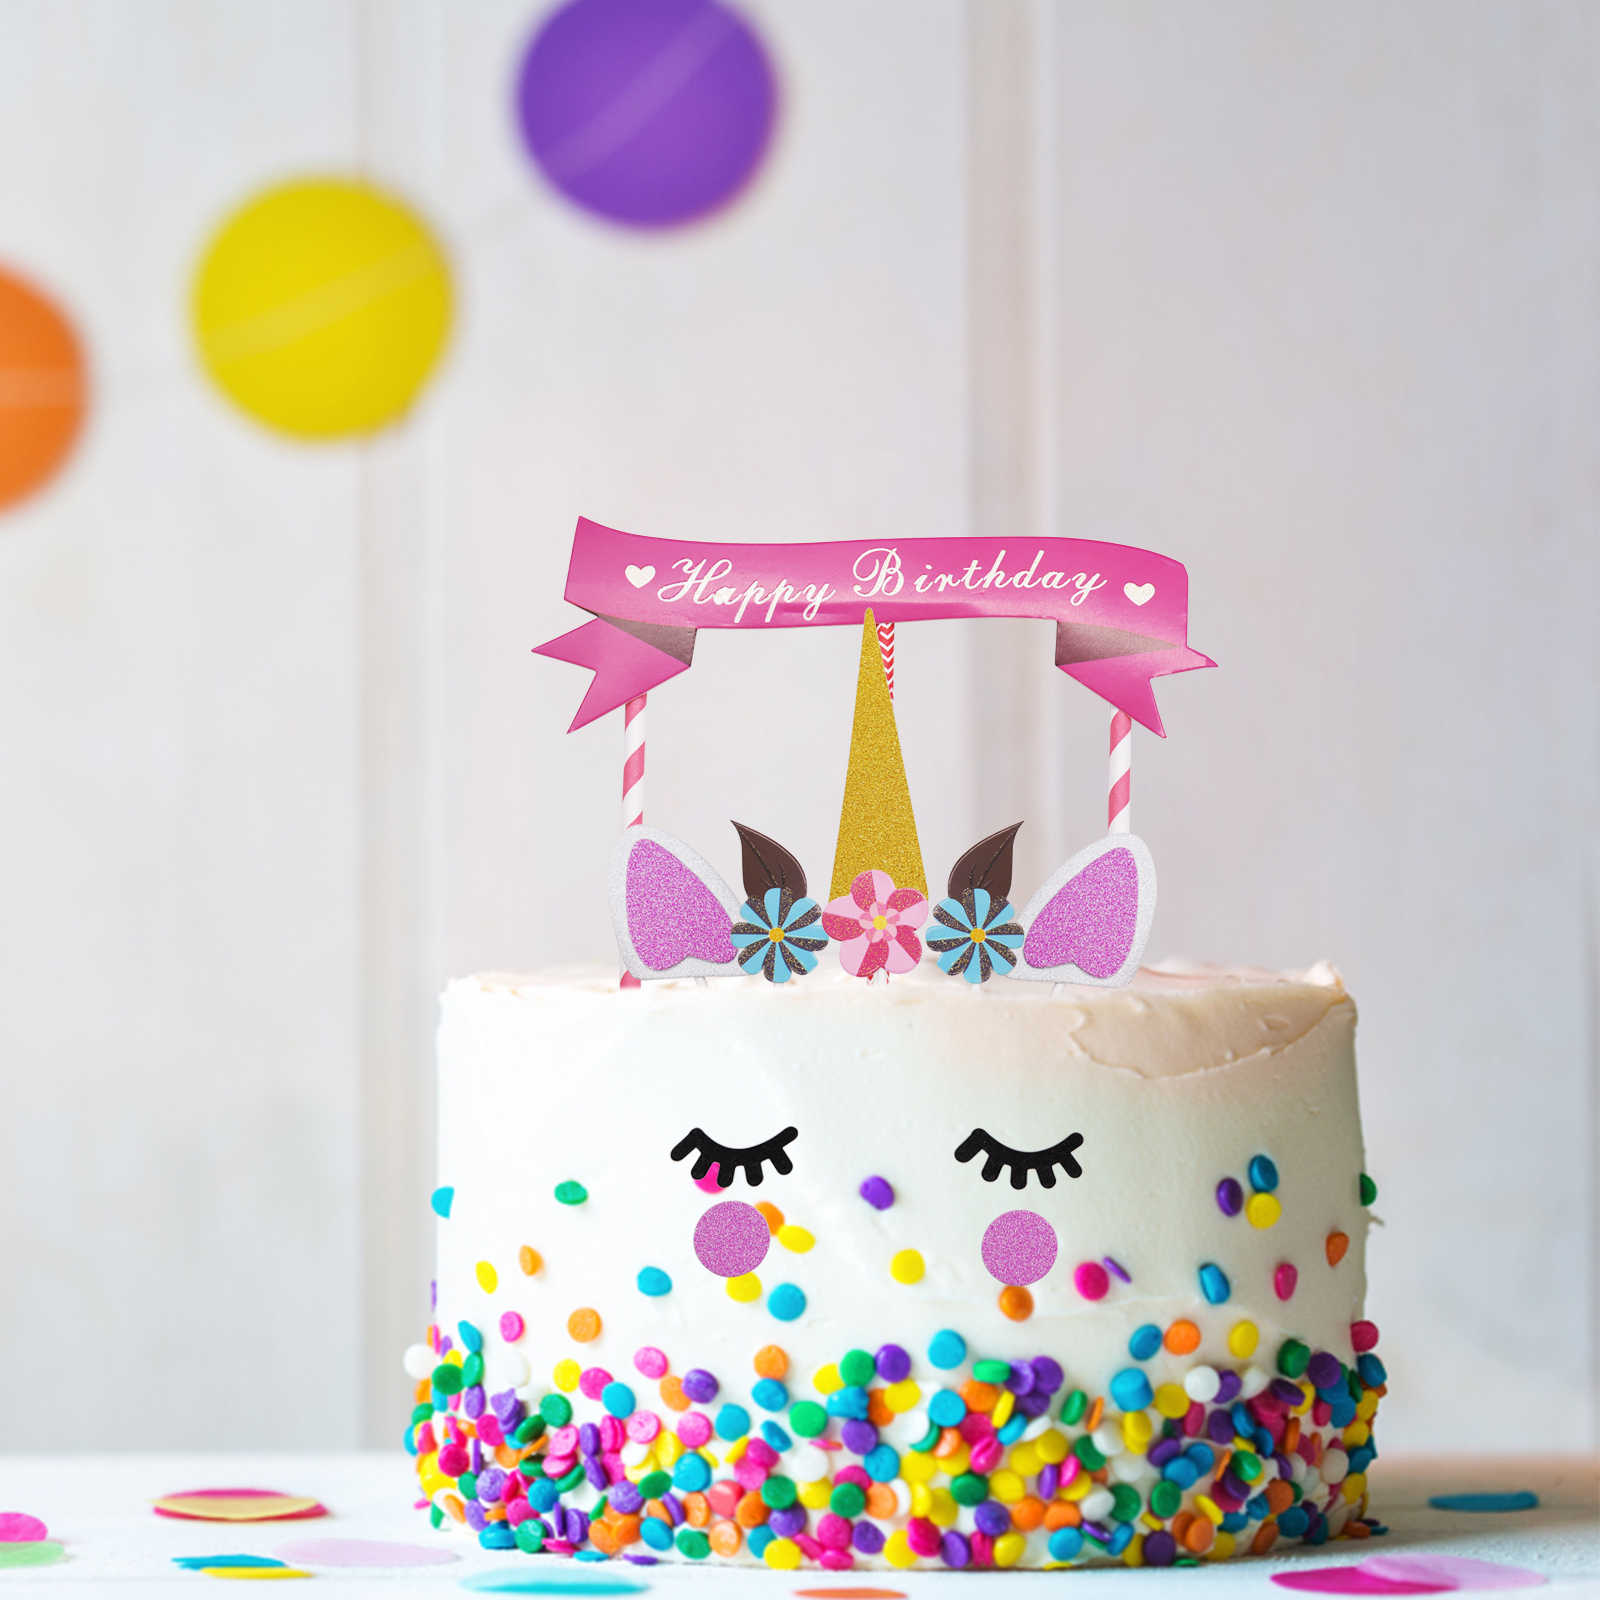 New 1set Unicorn Birthday Cake Decorations Set Horns Topper Kids Decorative Party Decor